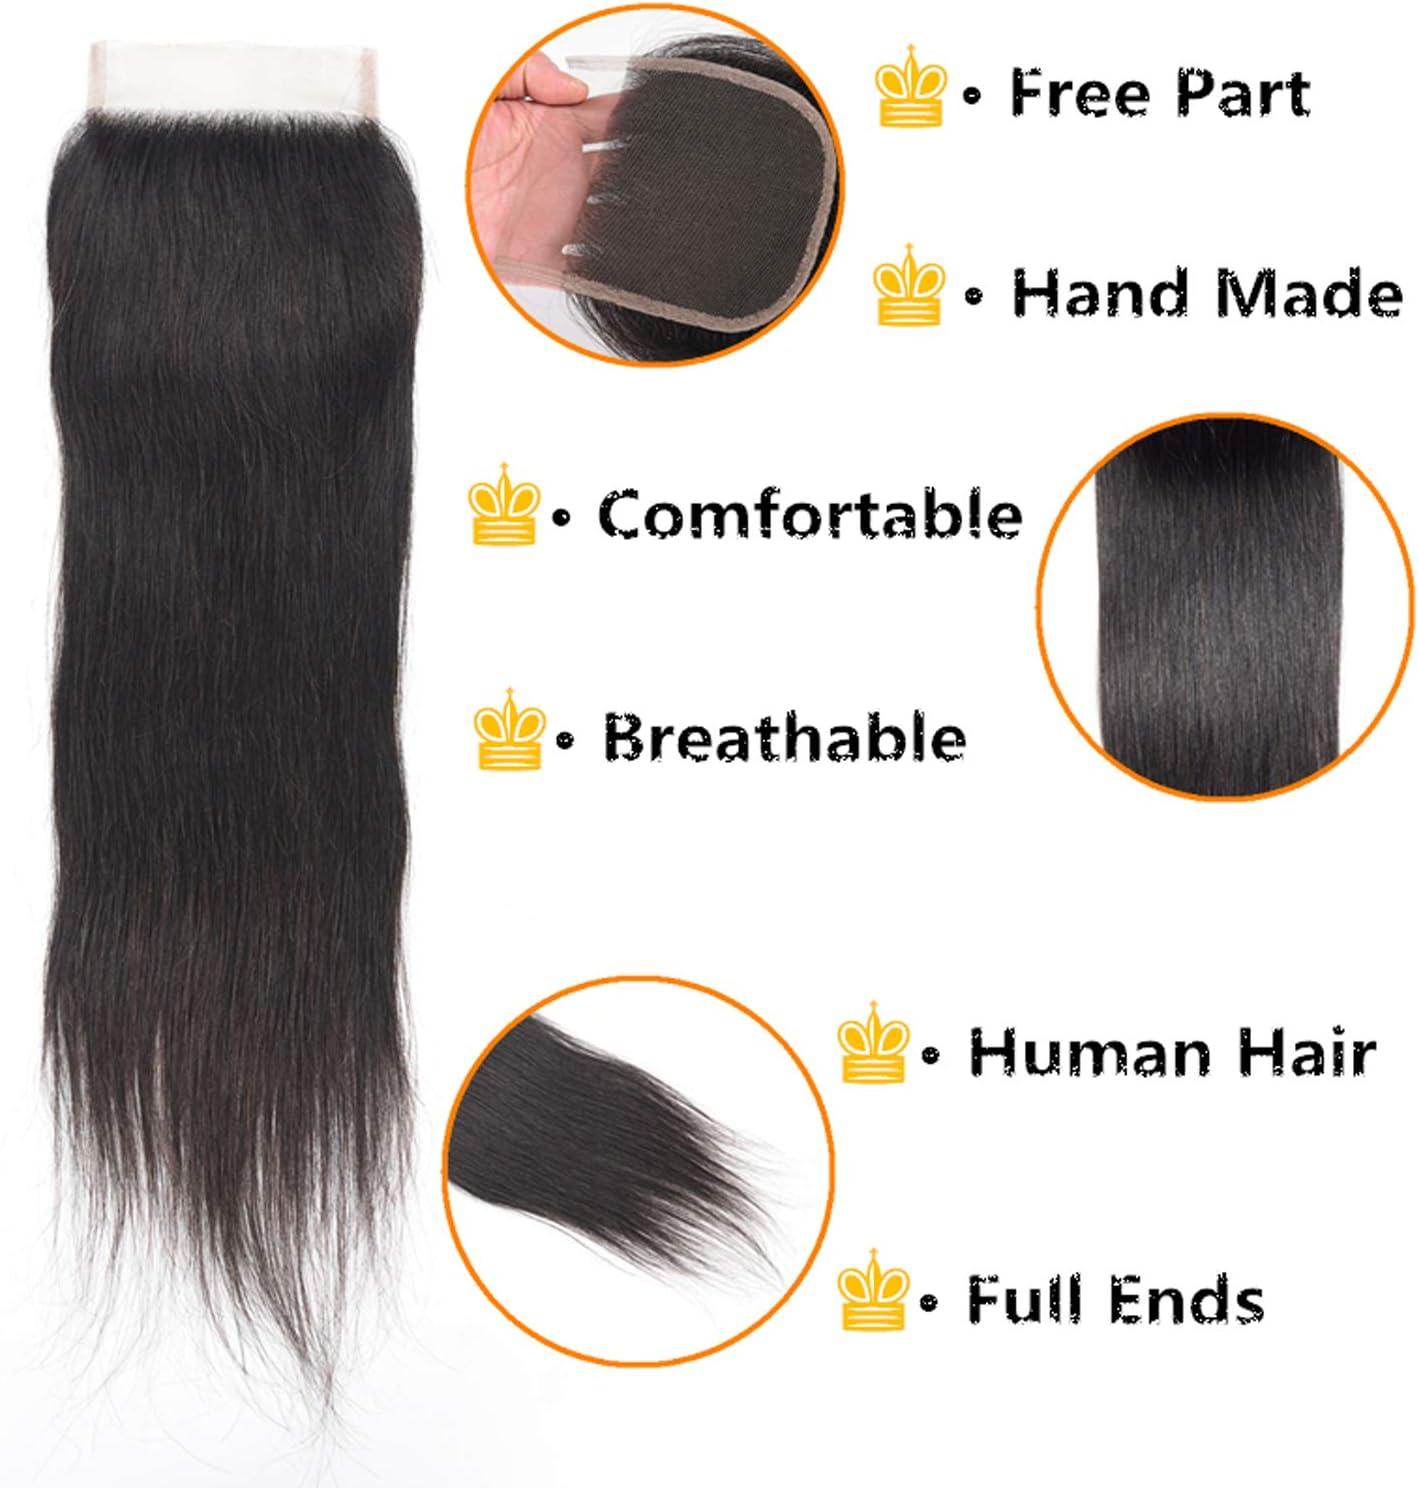 Ali Rain Brazilian Hair Bundles Straight Human Hair Bundles With Closure Unprocessed Virgin Hair 3 Bundles With Lace Closure 270g Natural Color 8 10 12 8 Free Part Amazon Co Uk Beauty